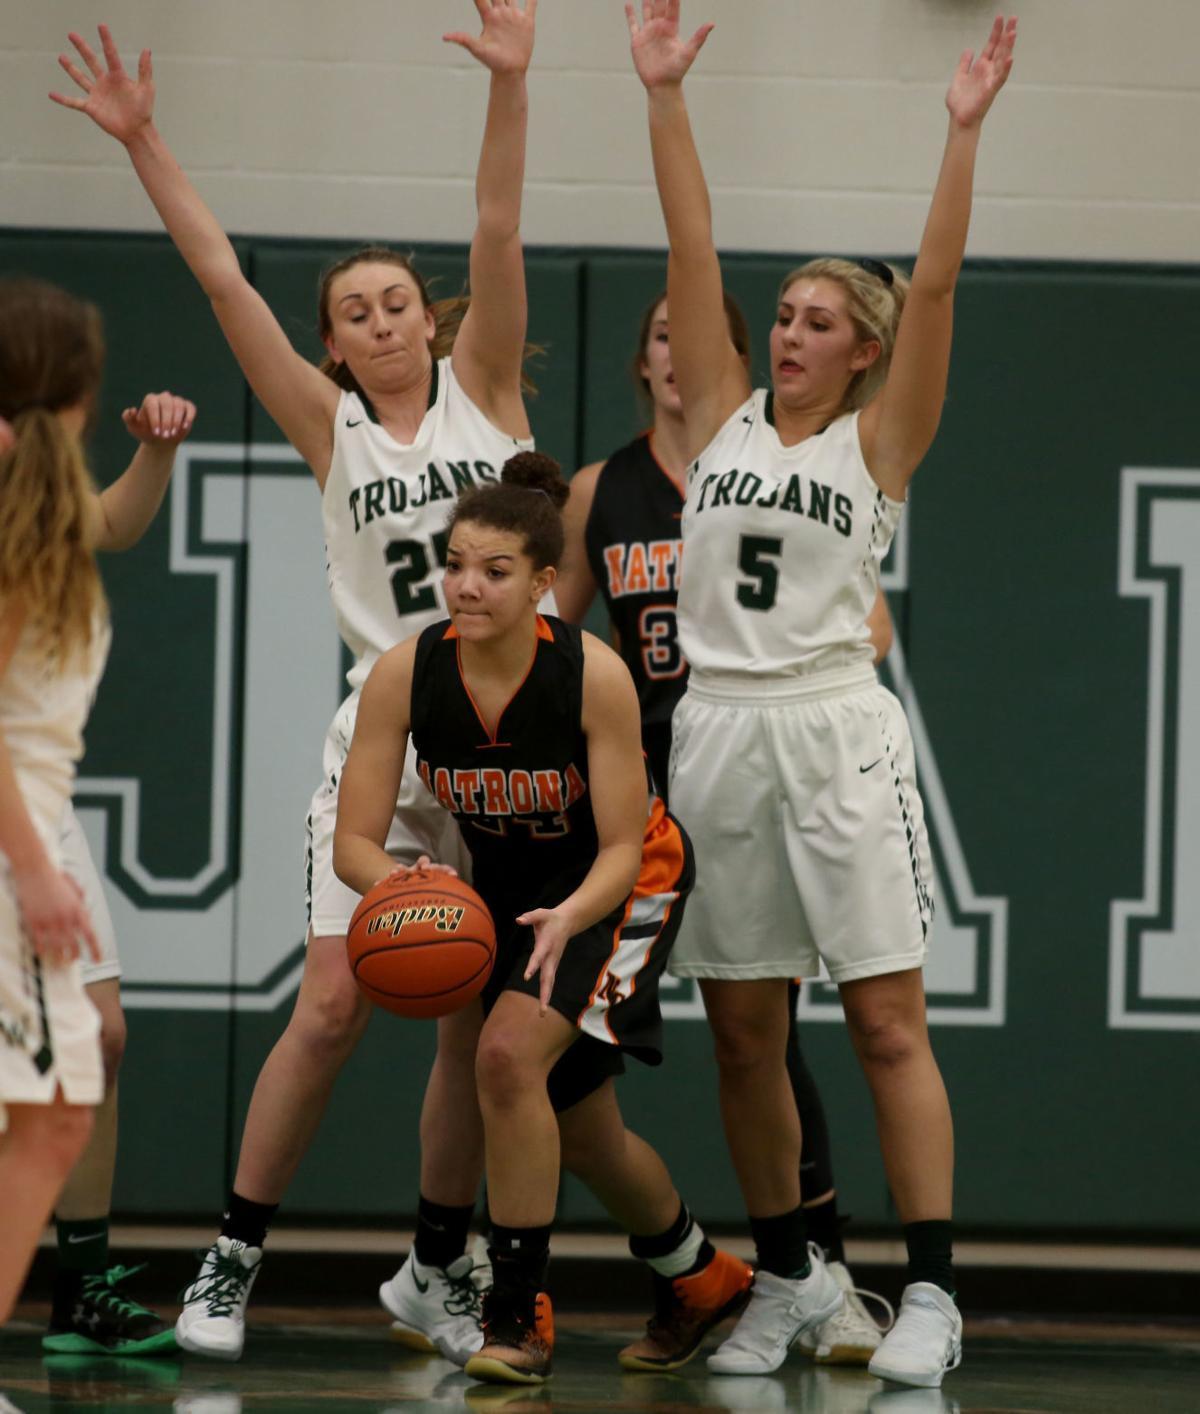 KW vs. NC Girls Basketball